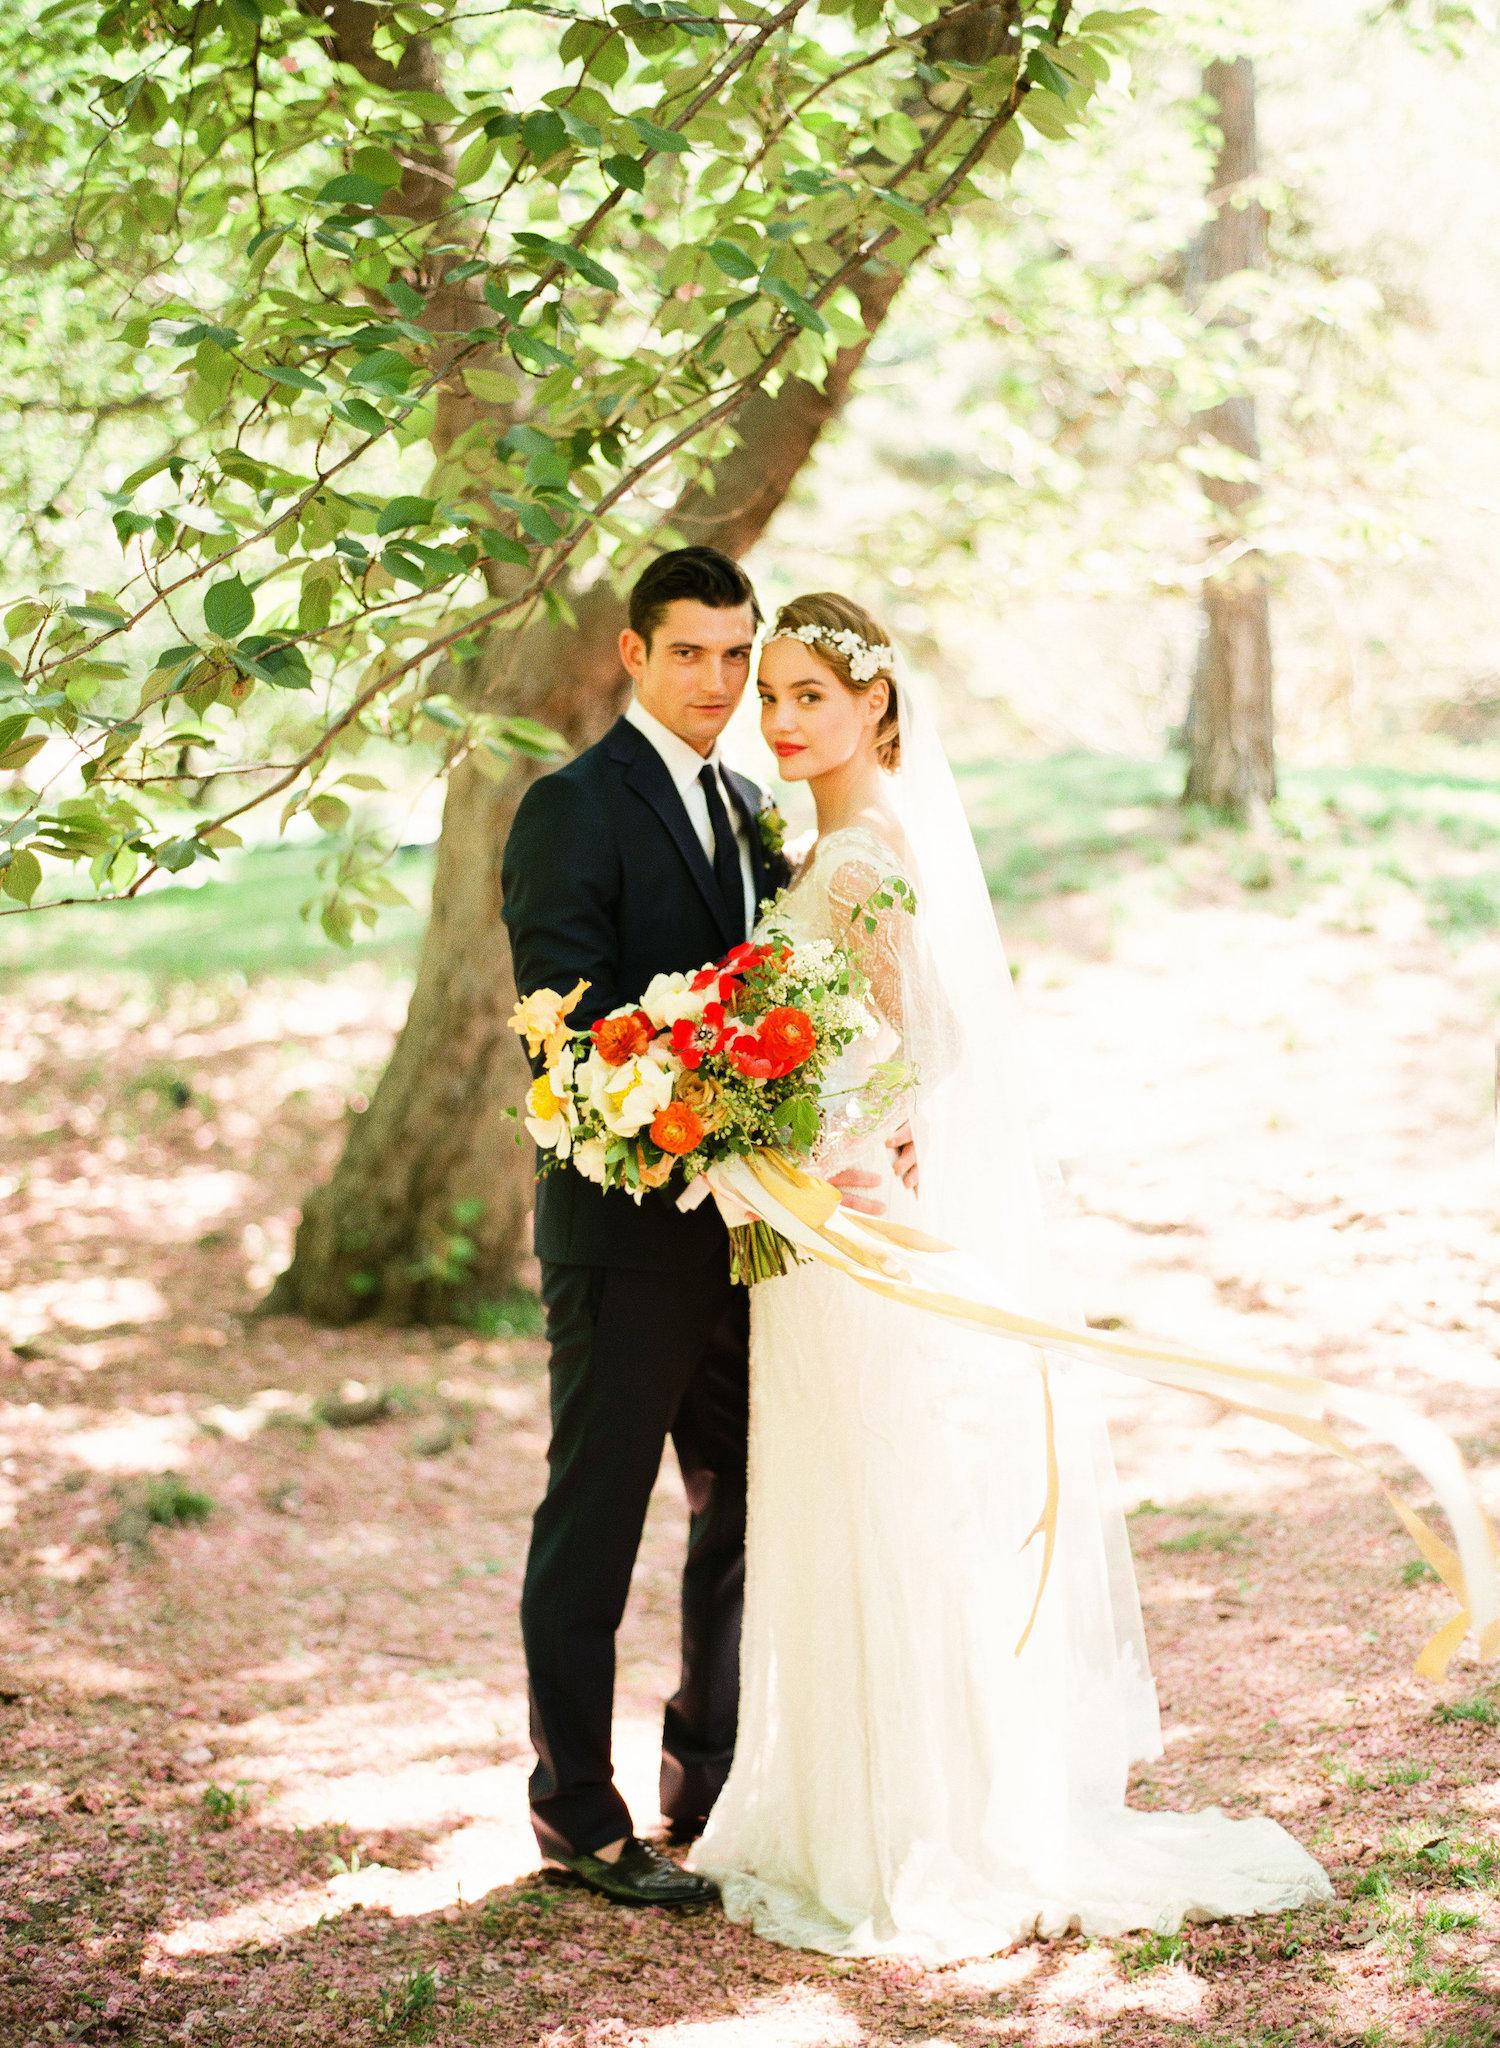 Morning Glow - Full Aperture Floral & Lindsay Madden Photography 25.jpeg